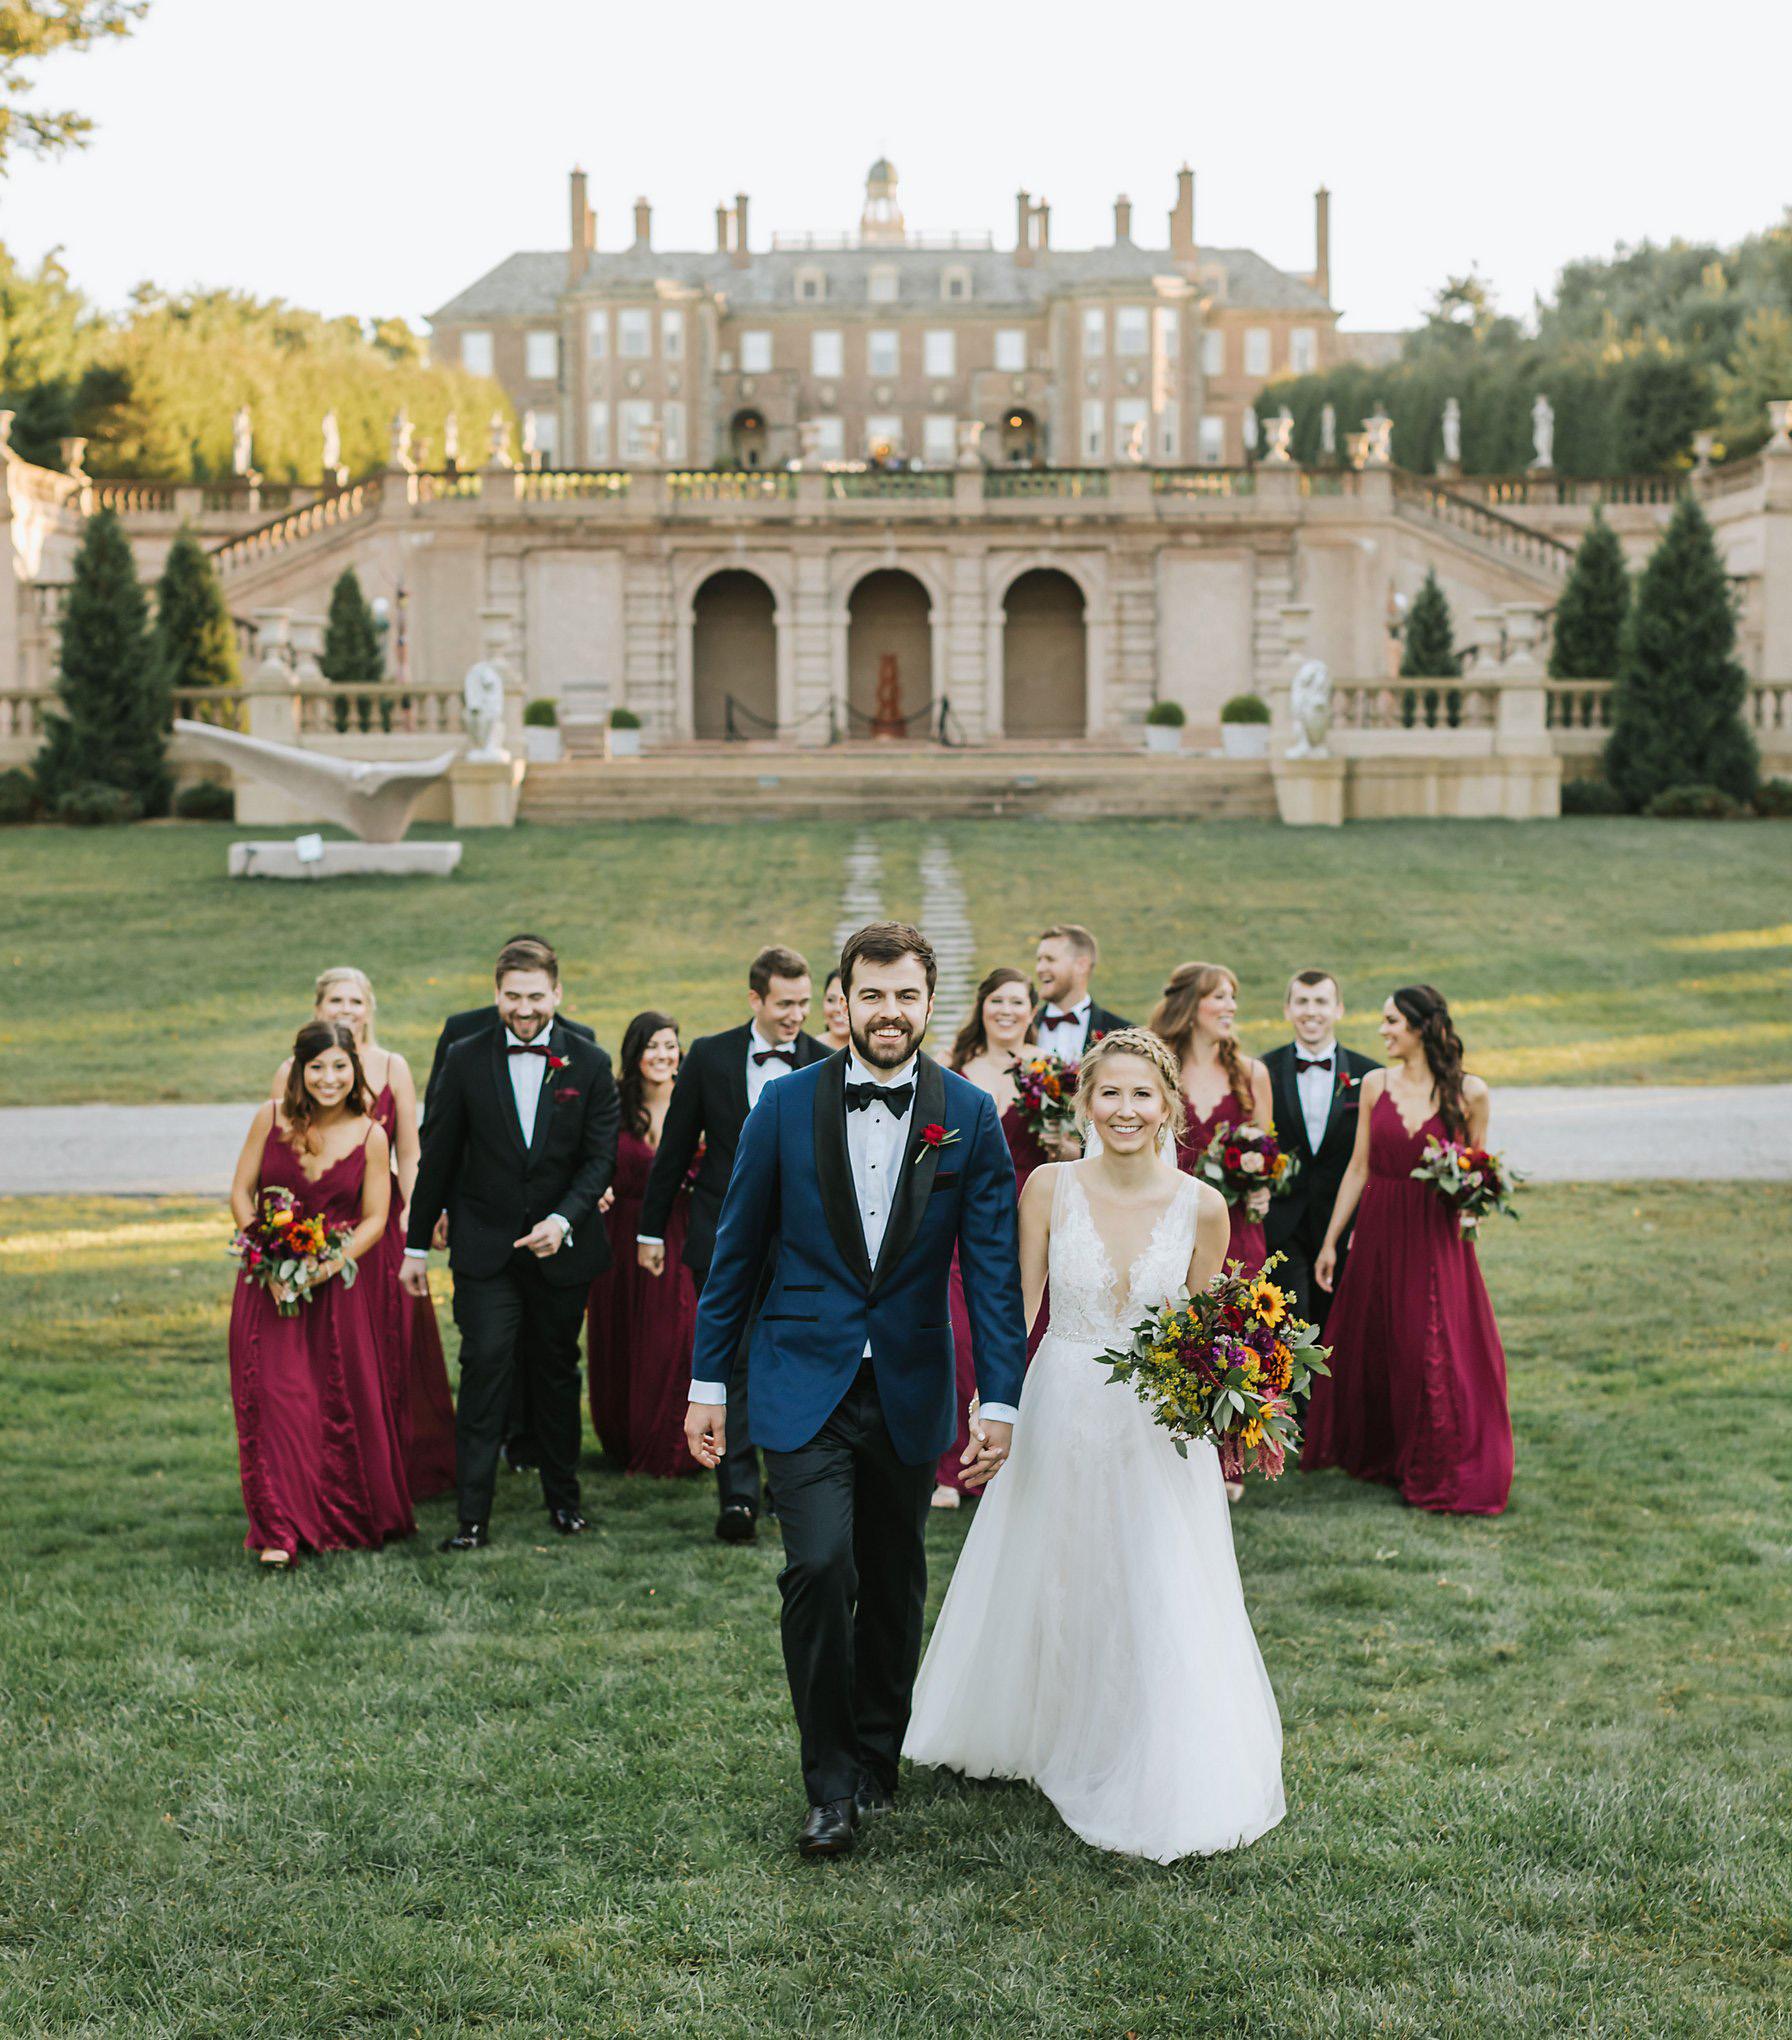 Crane-Estate-Wedding-Castle-Hill-Photographer-019.JPG